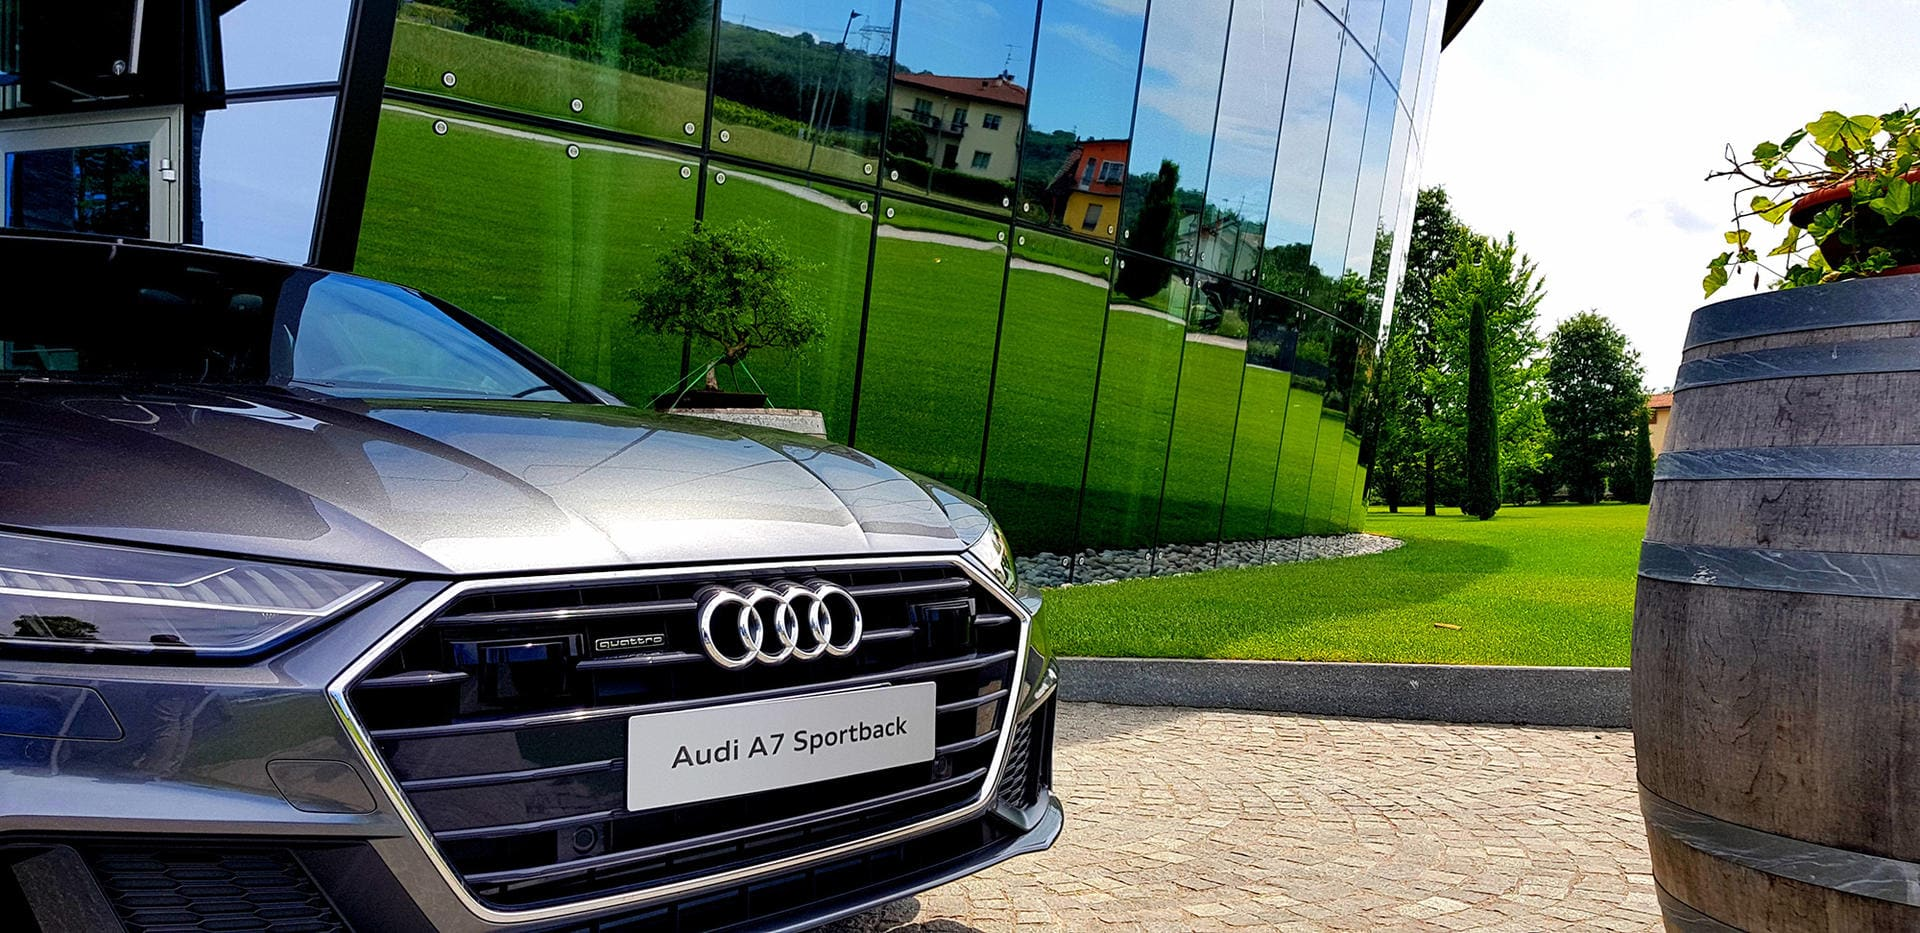 09.05.2018 - Audi